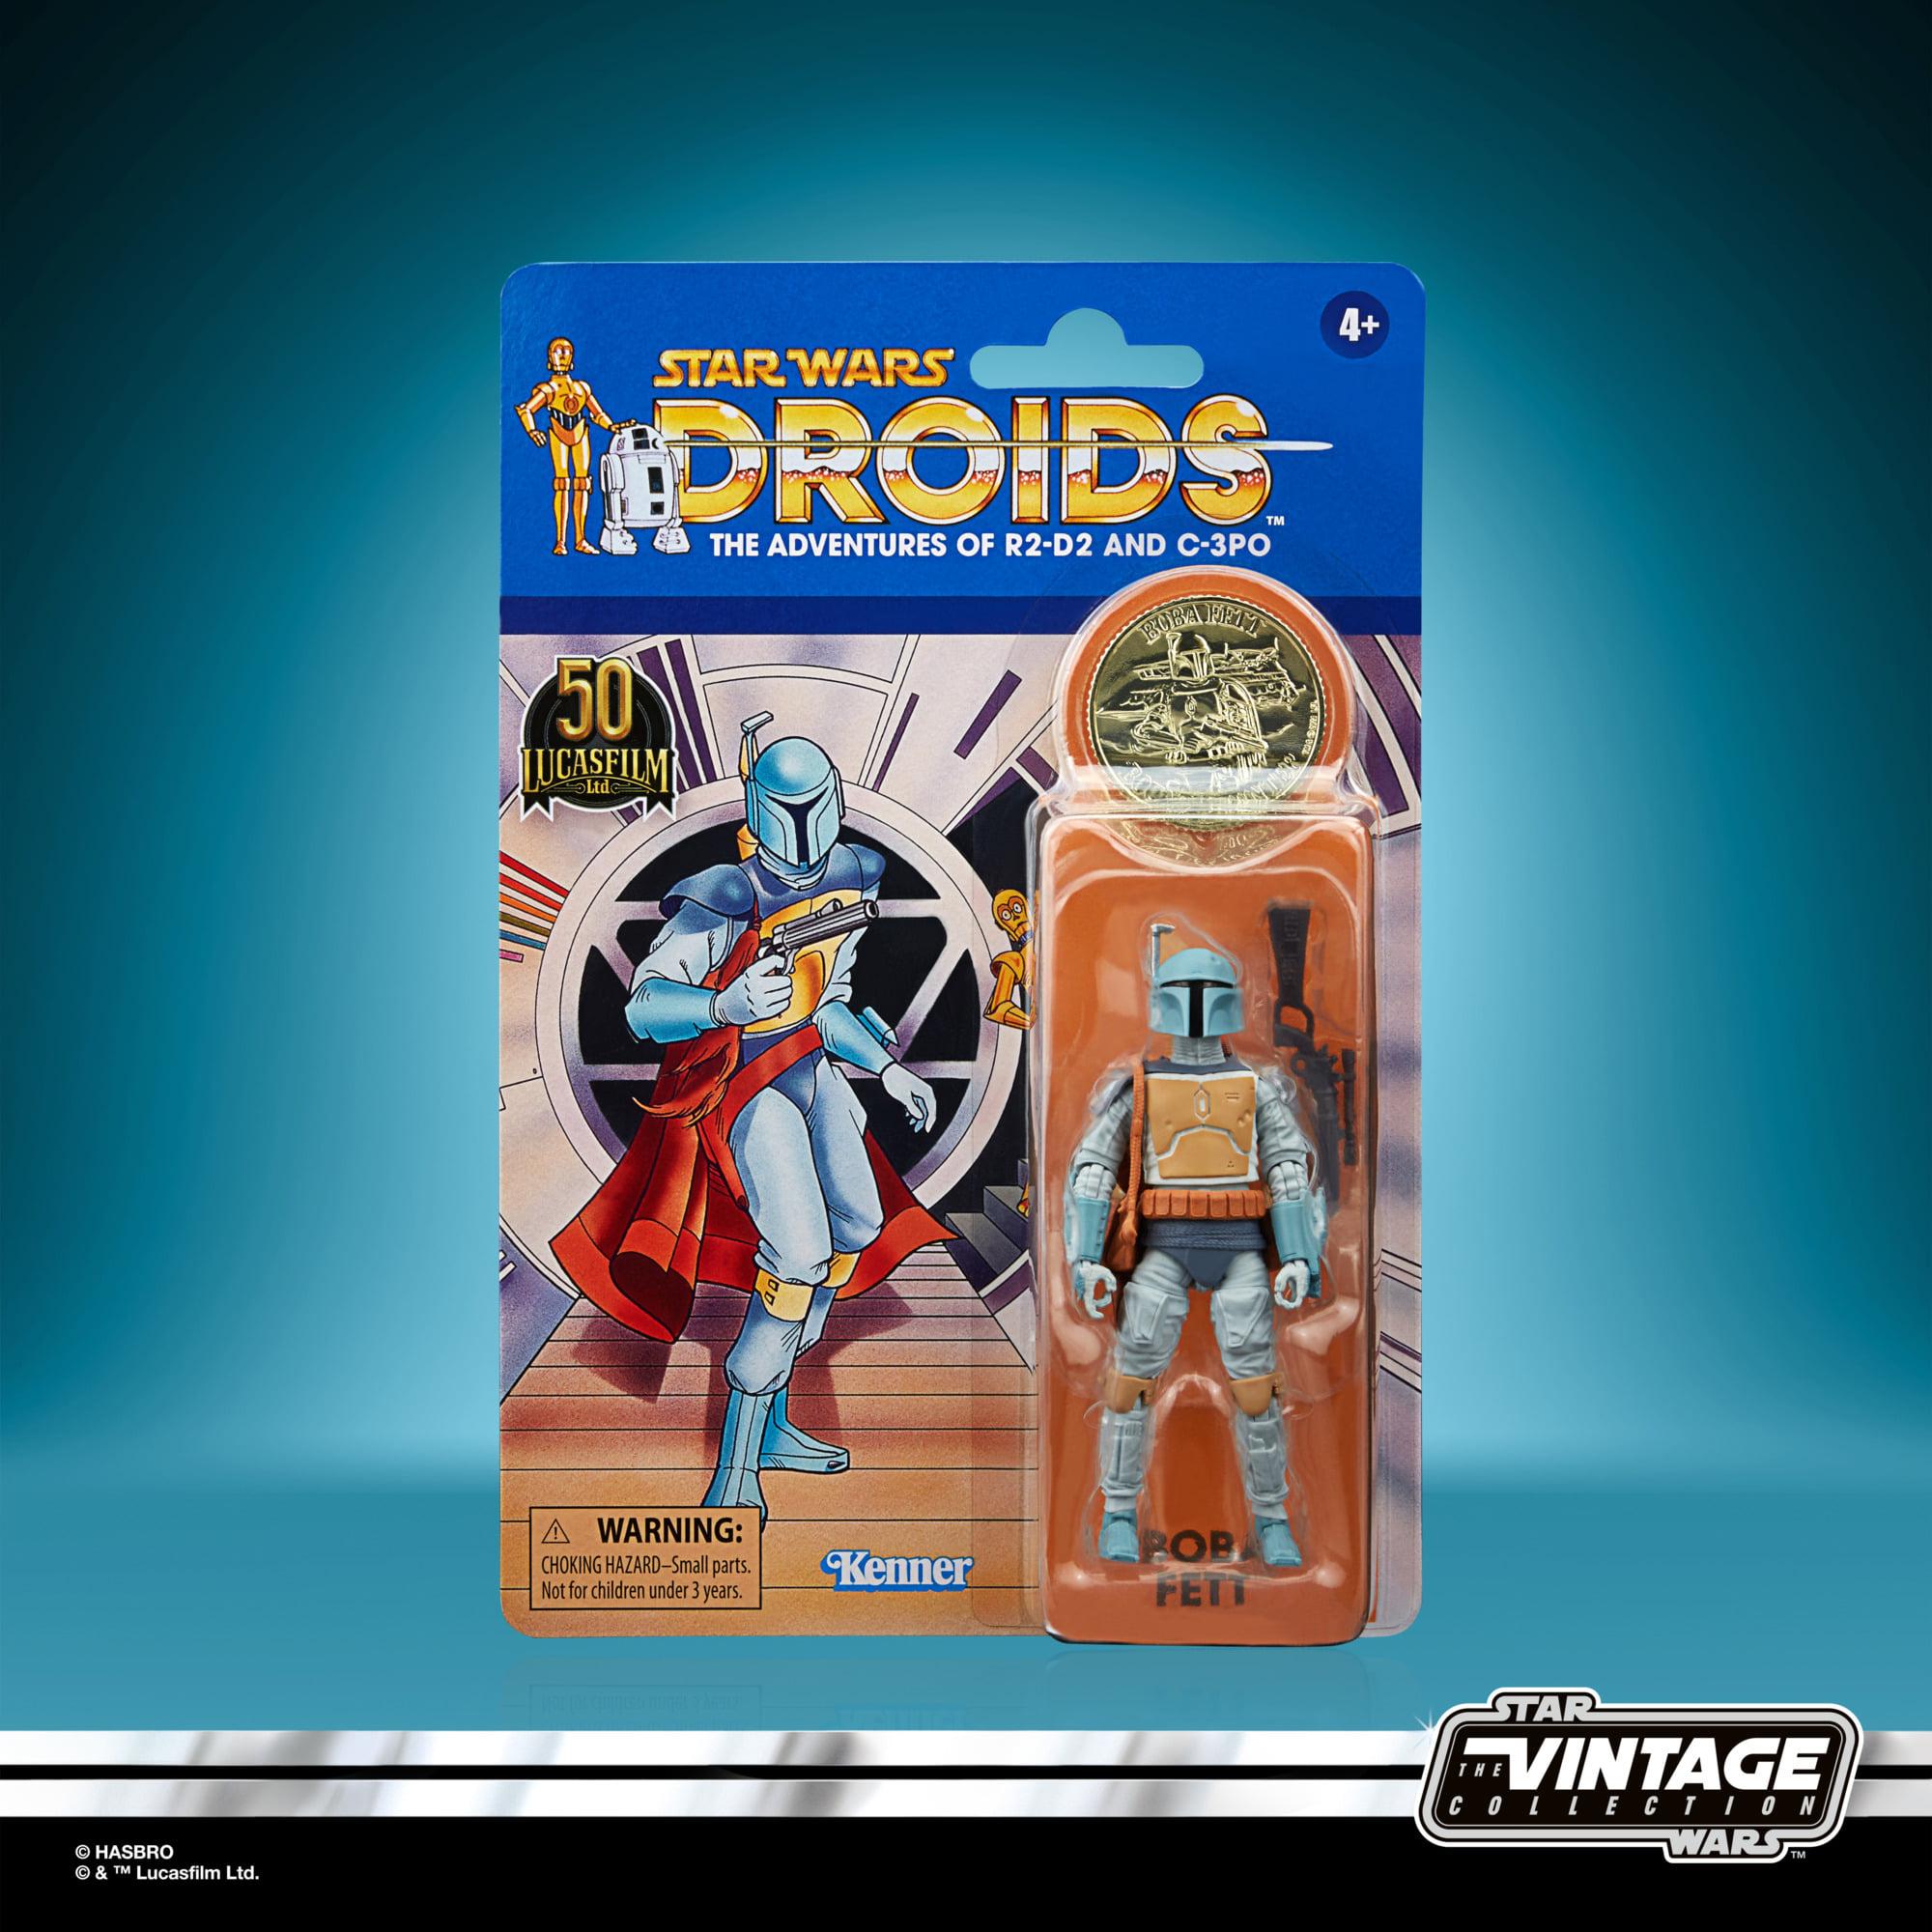 VC-Boba-Fett-Droids-Lucasfilm-50th-Anniversary-Carded-1.jpg